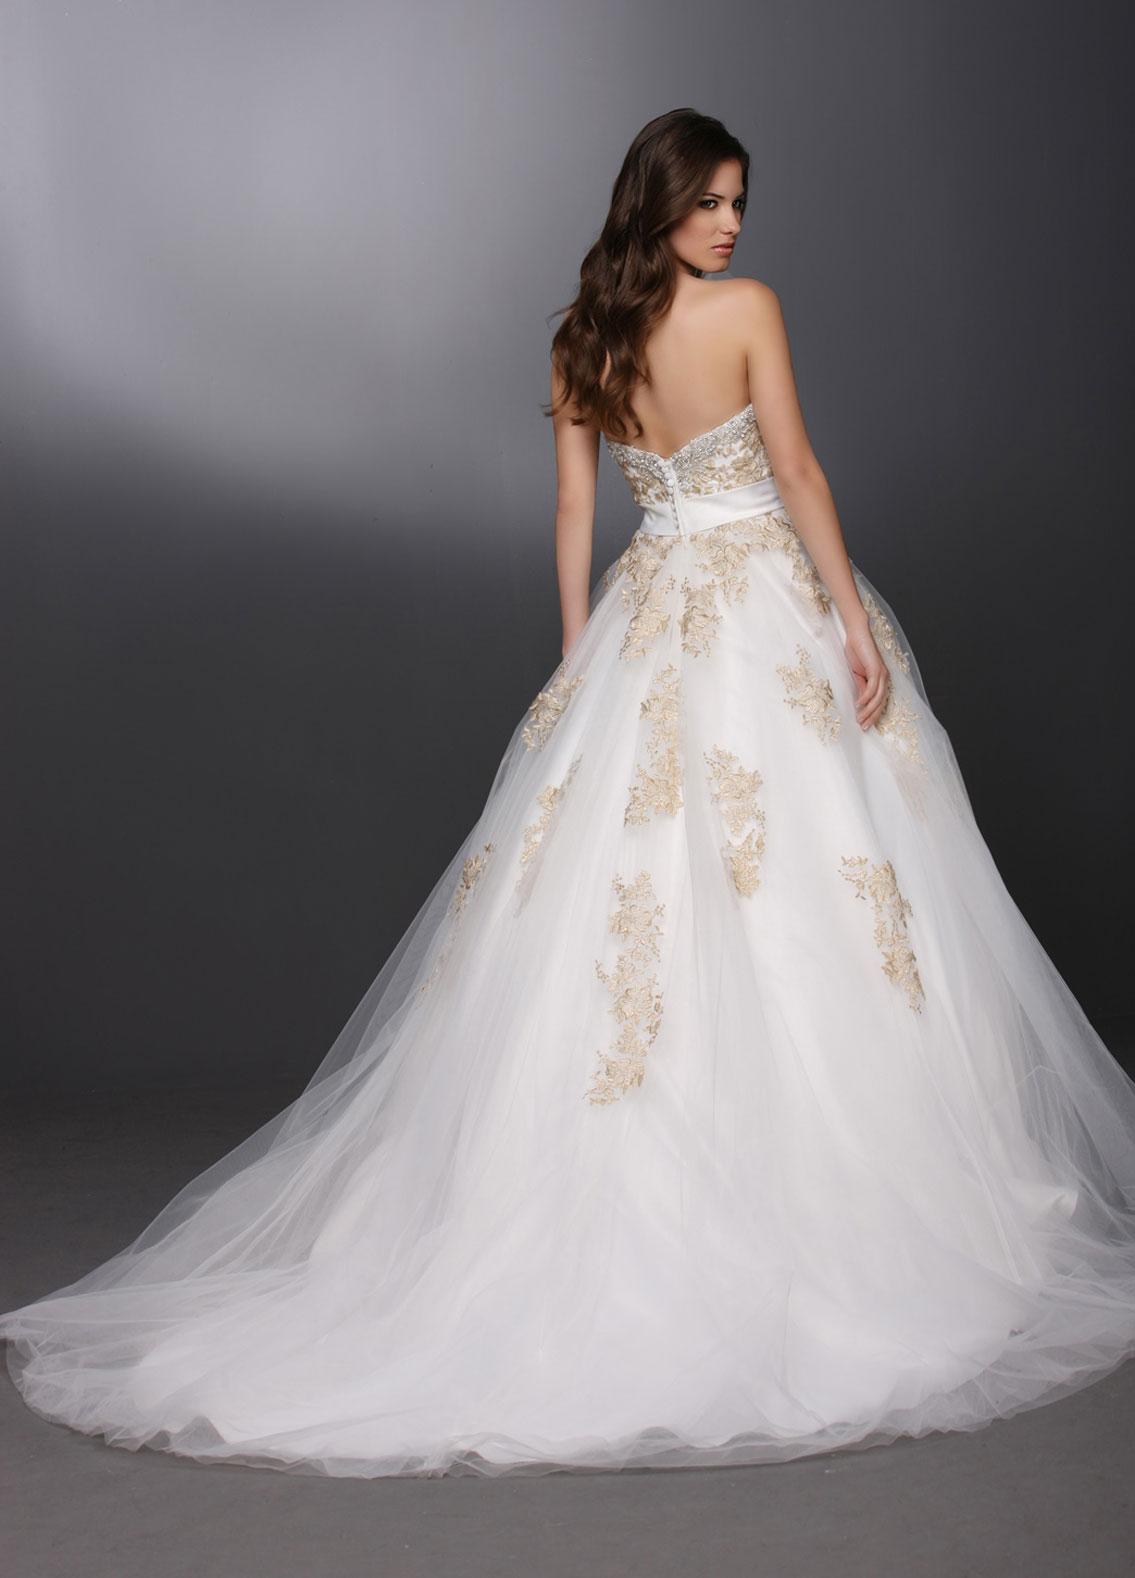 davinci-bridal-gown-07.jpg